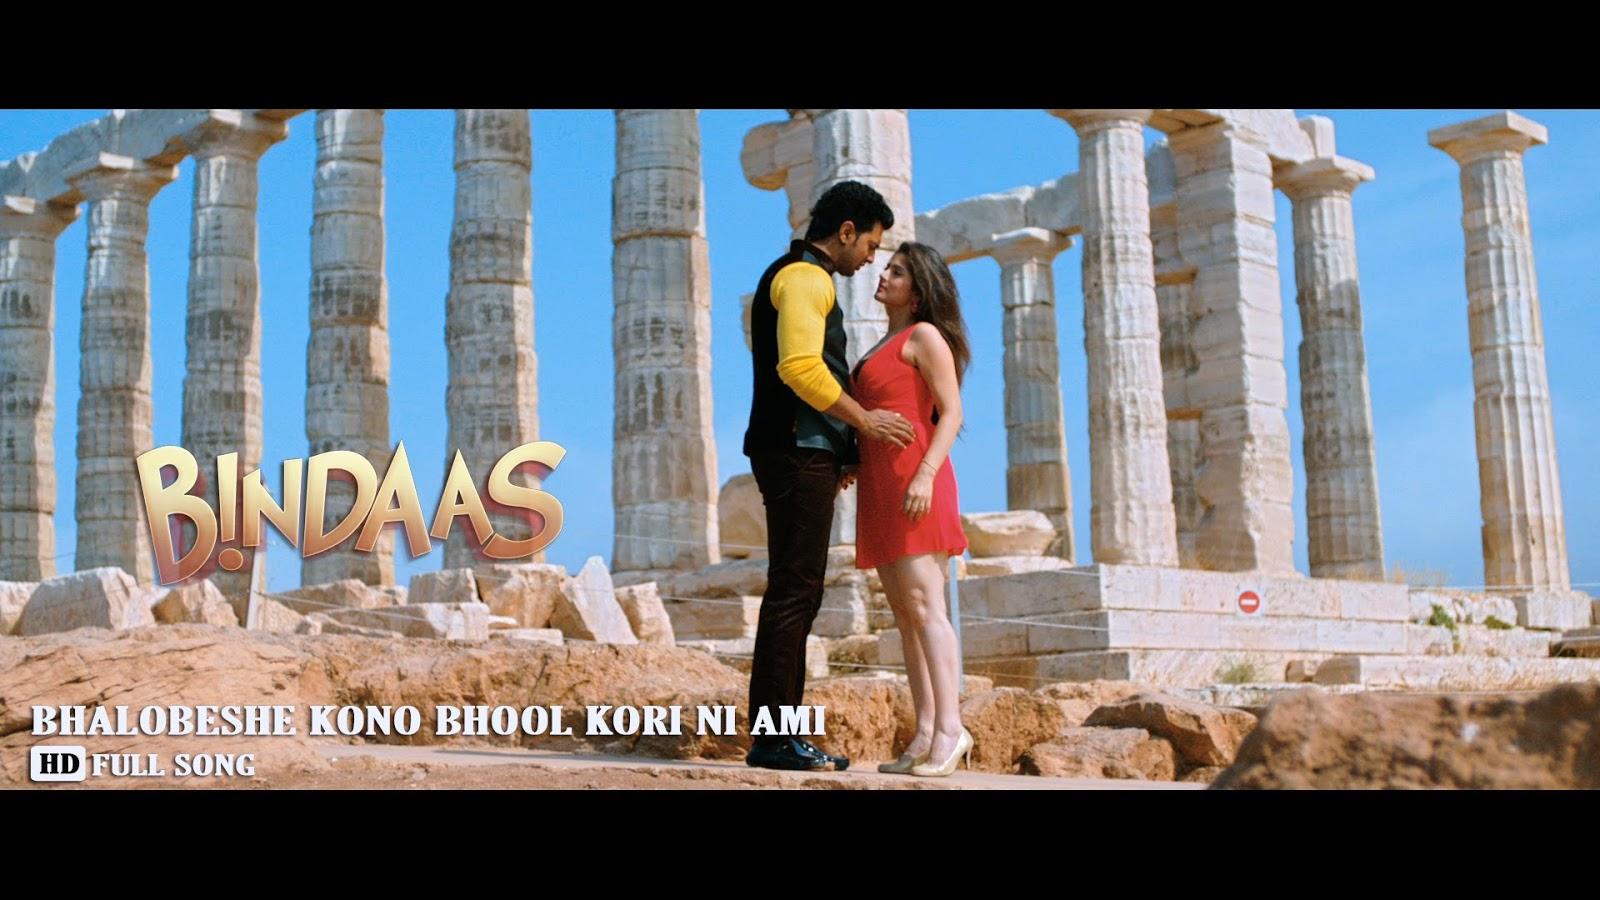 Bhalobeshe Kono Bhool Kori Ni Ami - Bindaas (2014) Music Video